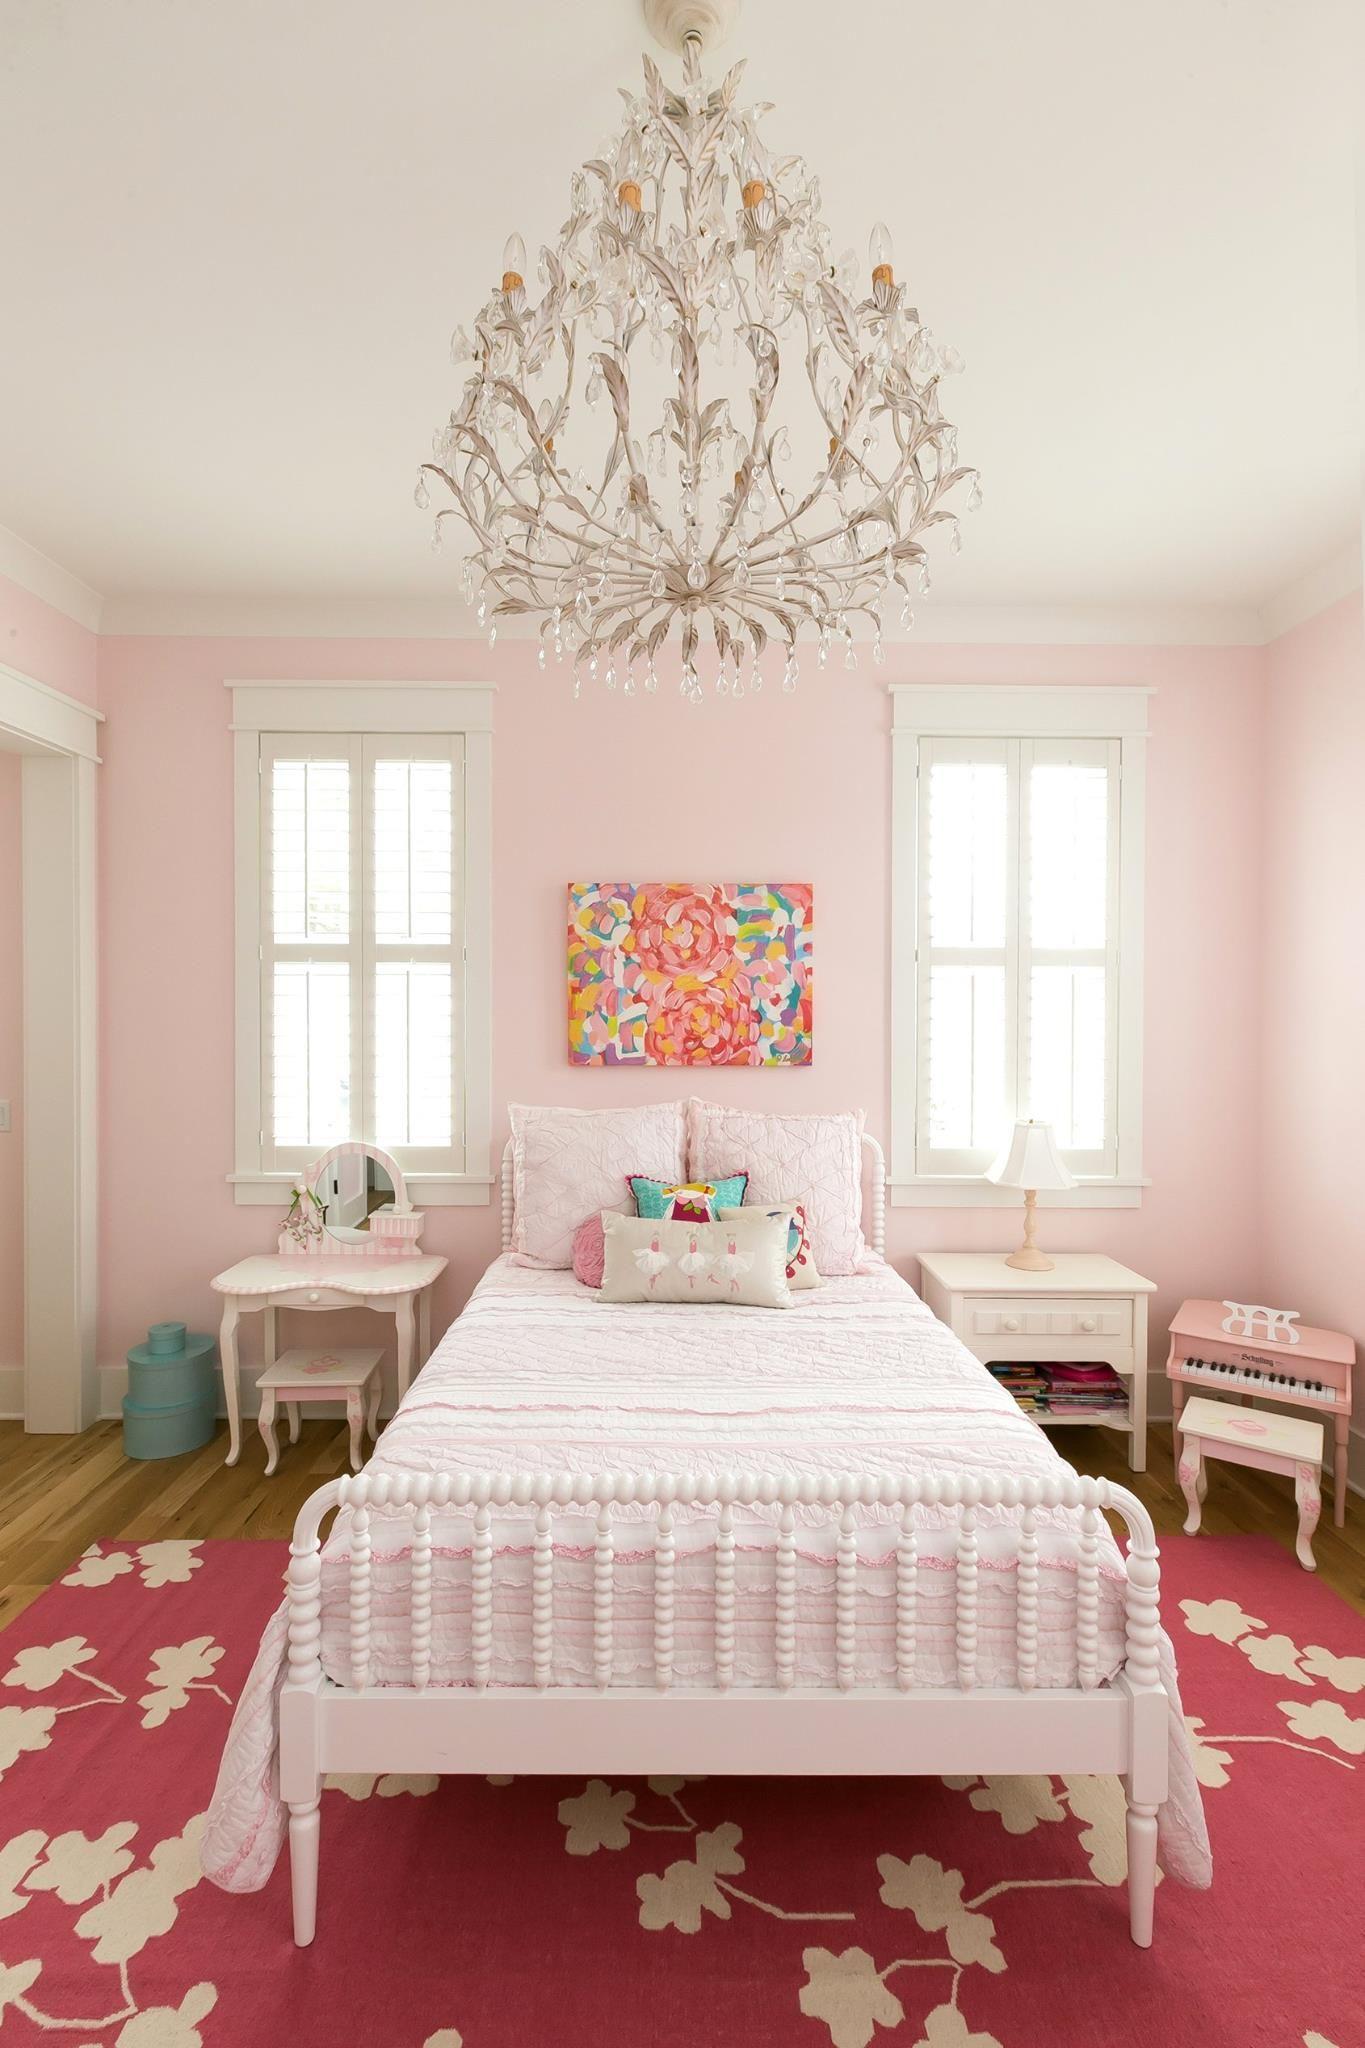 Pale Pink Bedroom Girls Room Chandelier White Antique Bed Dark Pink Rug Pale Pink